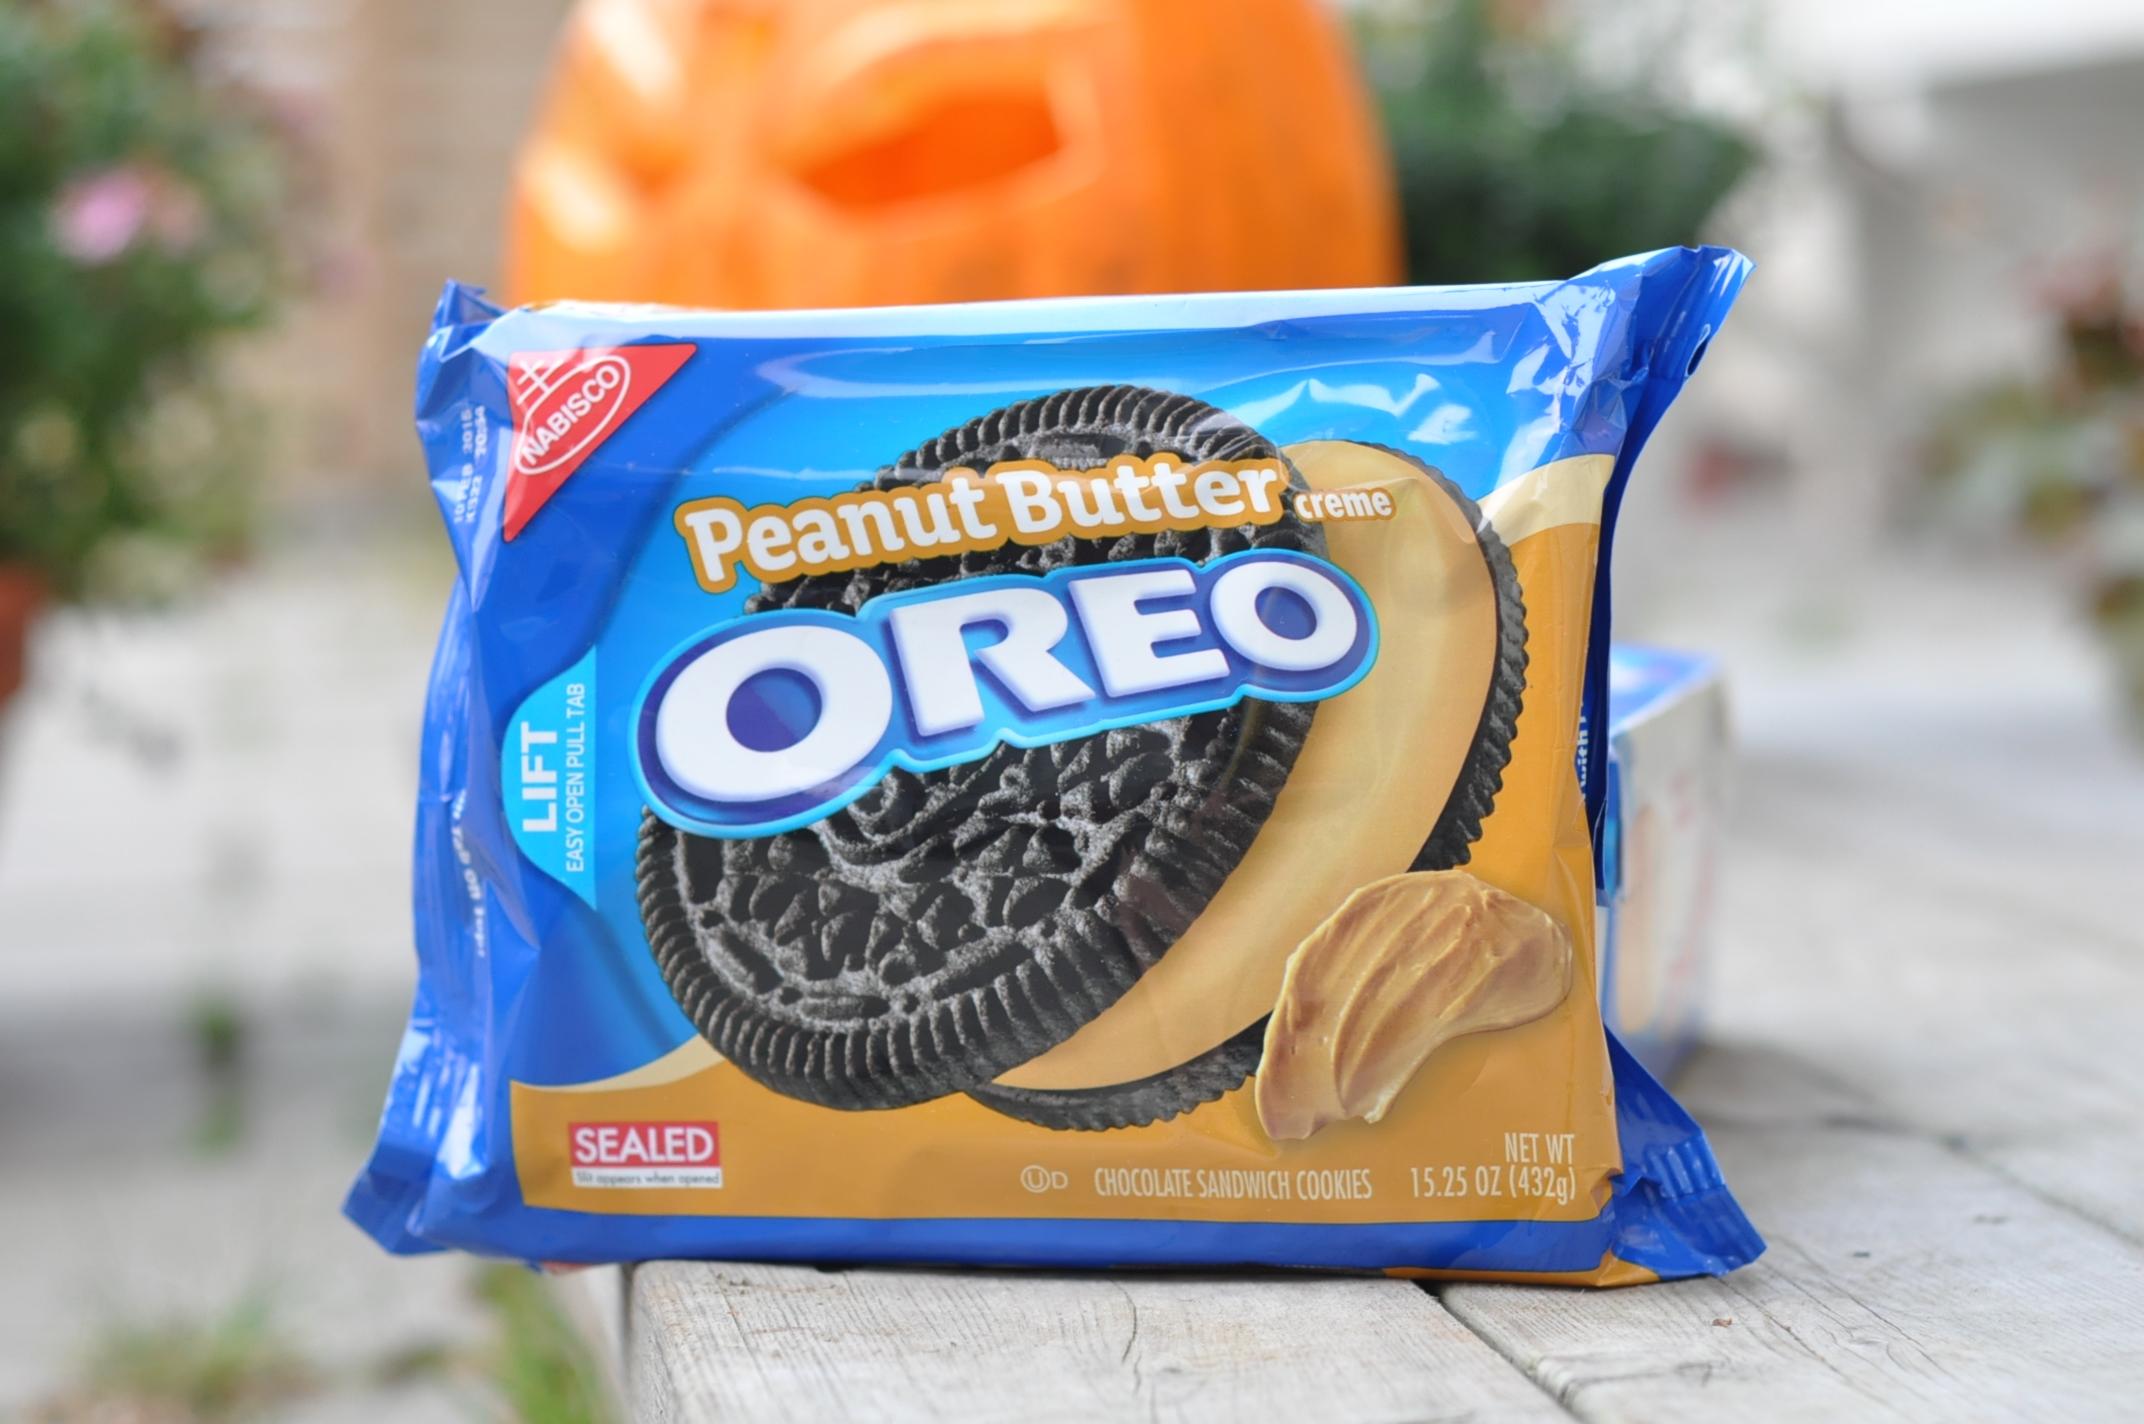 Peanut Butter Oreo